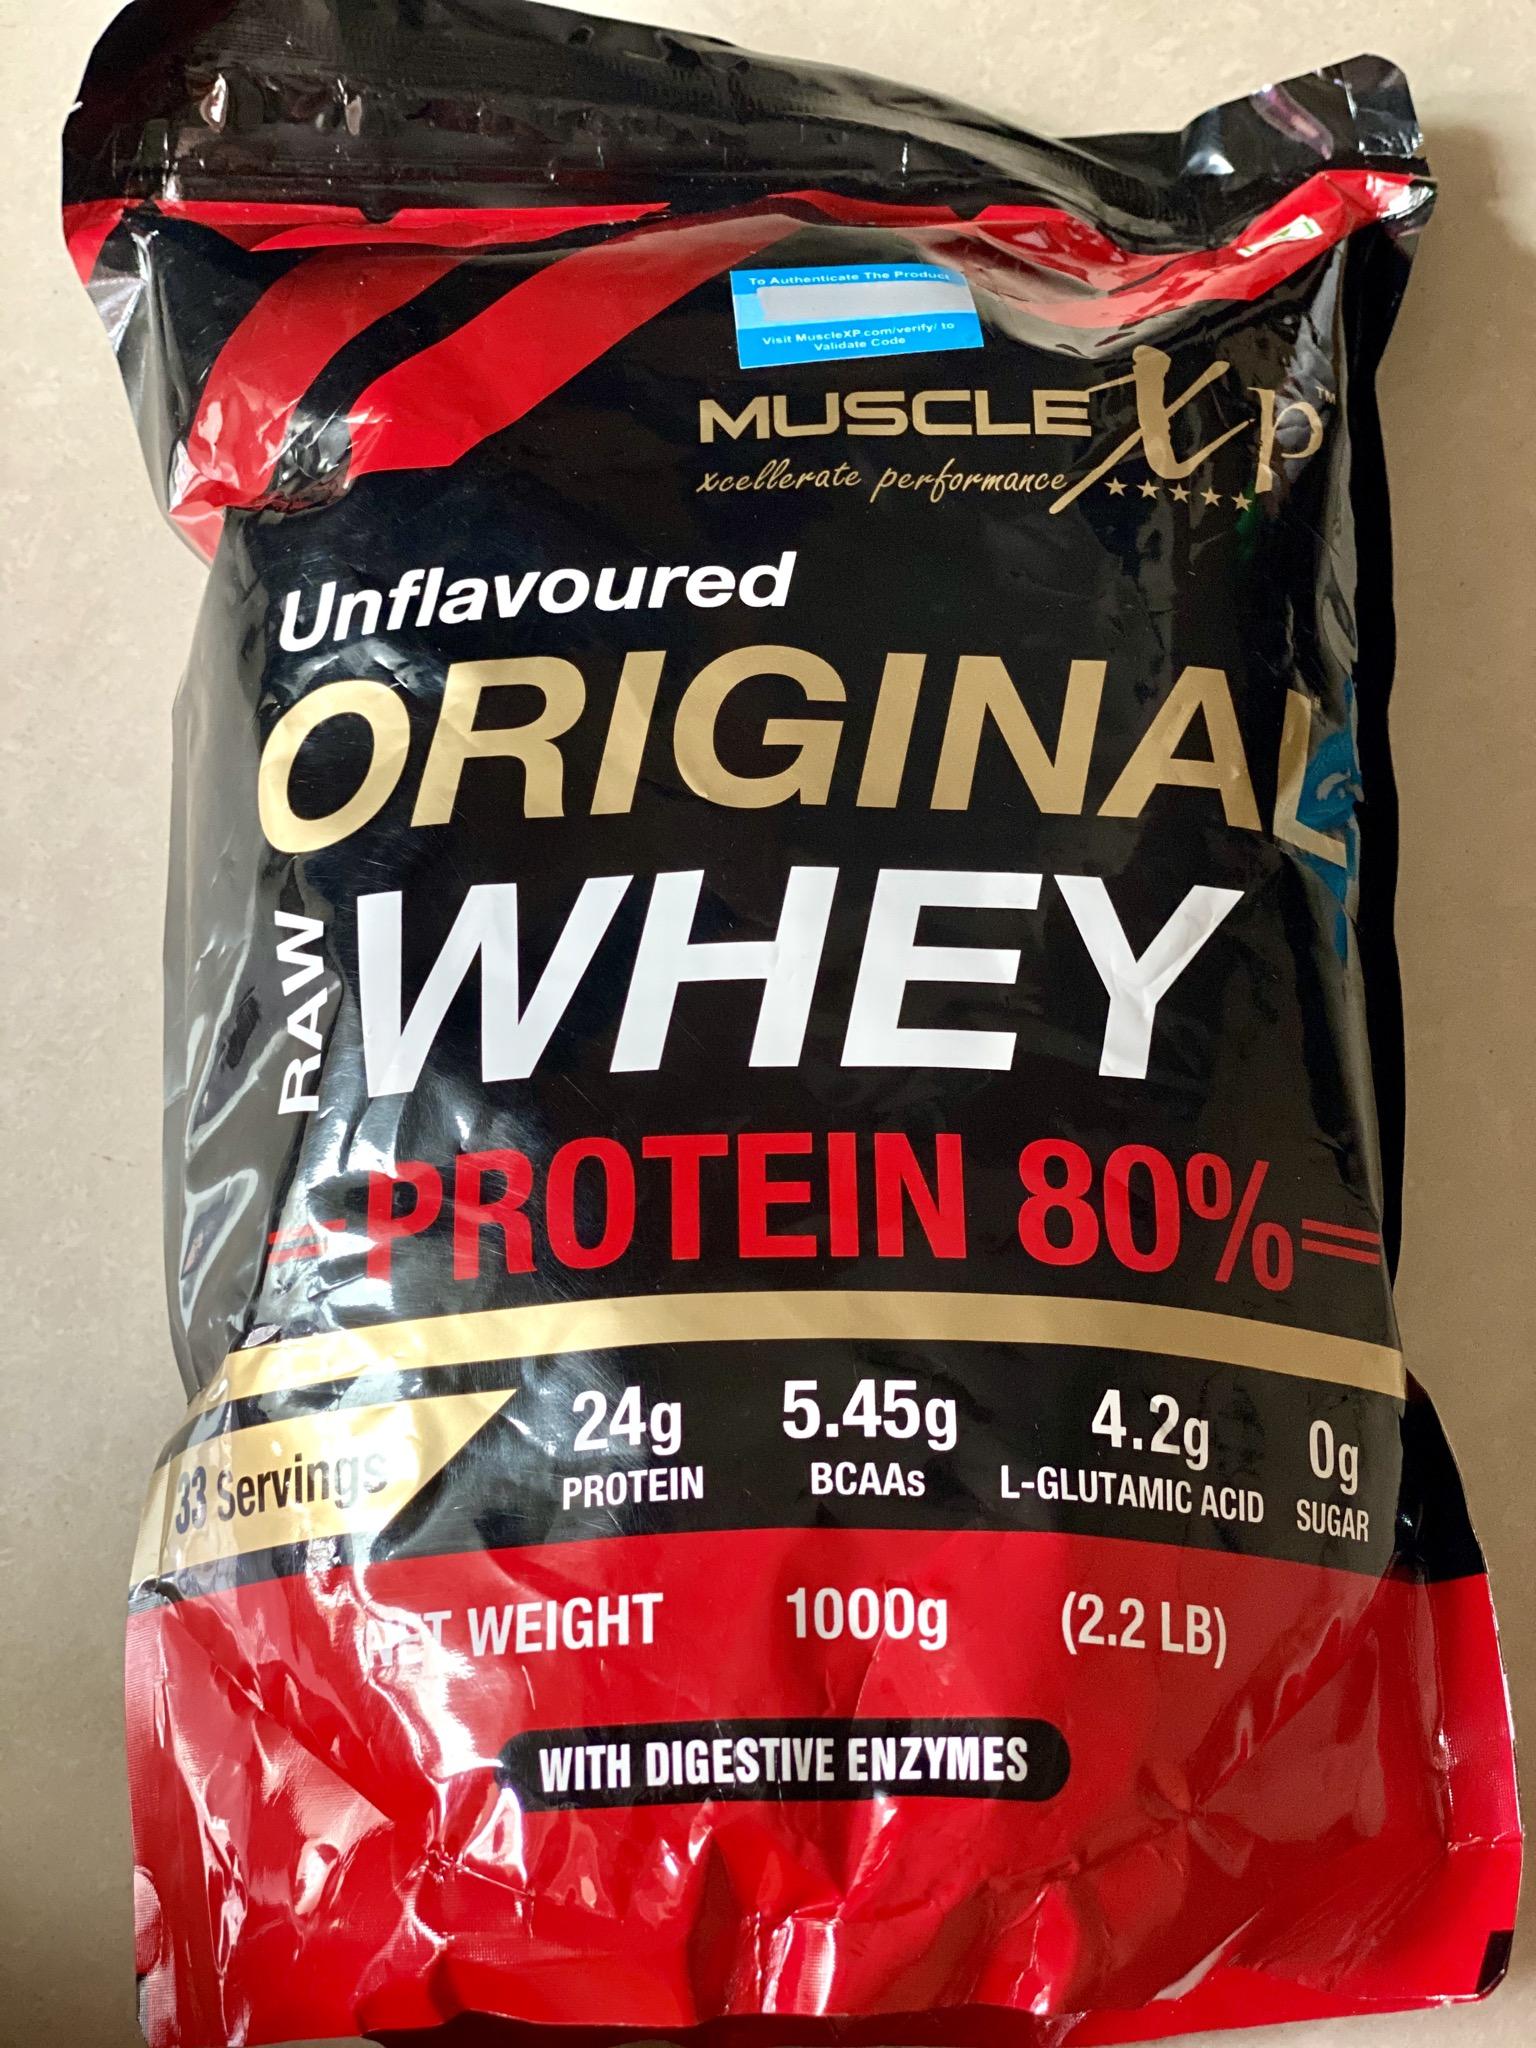 MuscleXP Raw Whey Protein 80% Powder Unflavoured-Best raw whey protein-By yogita_parmar